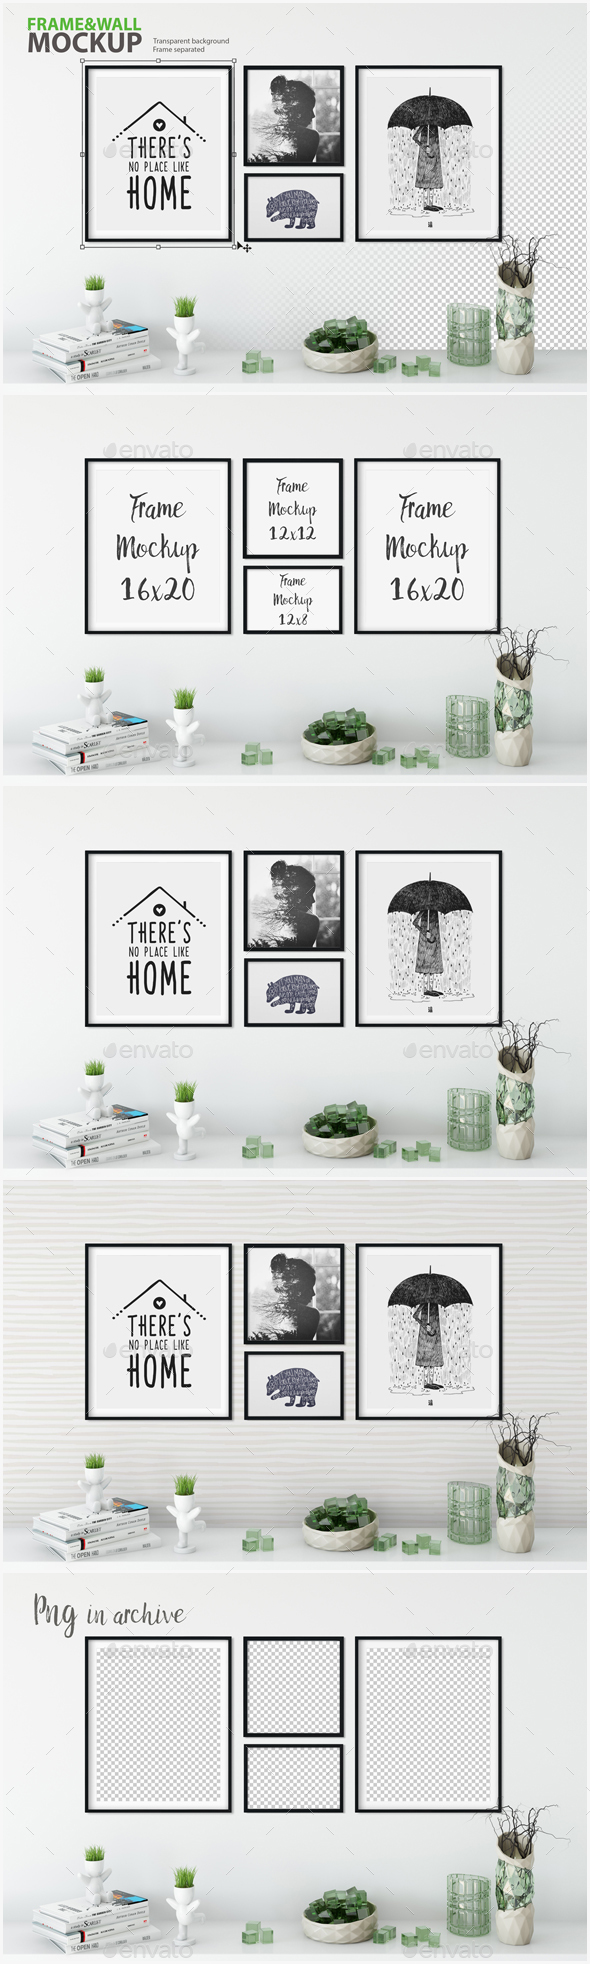 Frame & Wall Mockup 07 - Posters Print